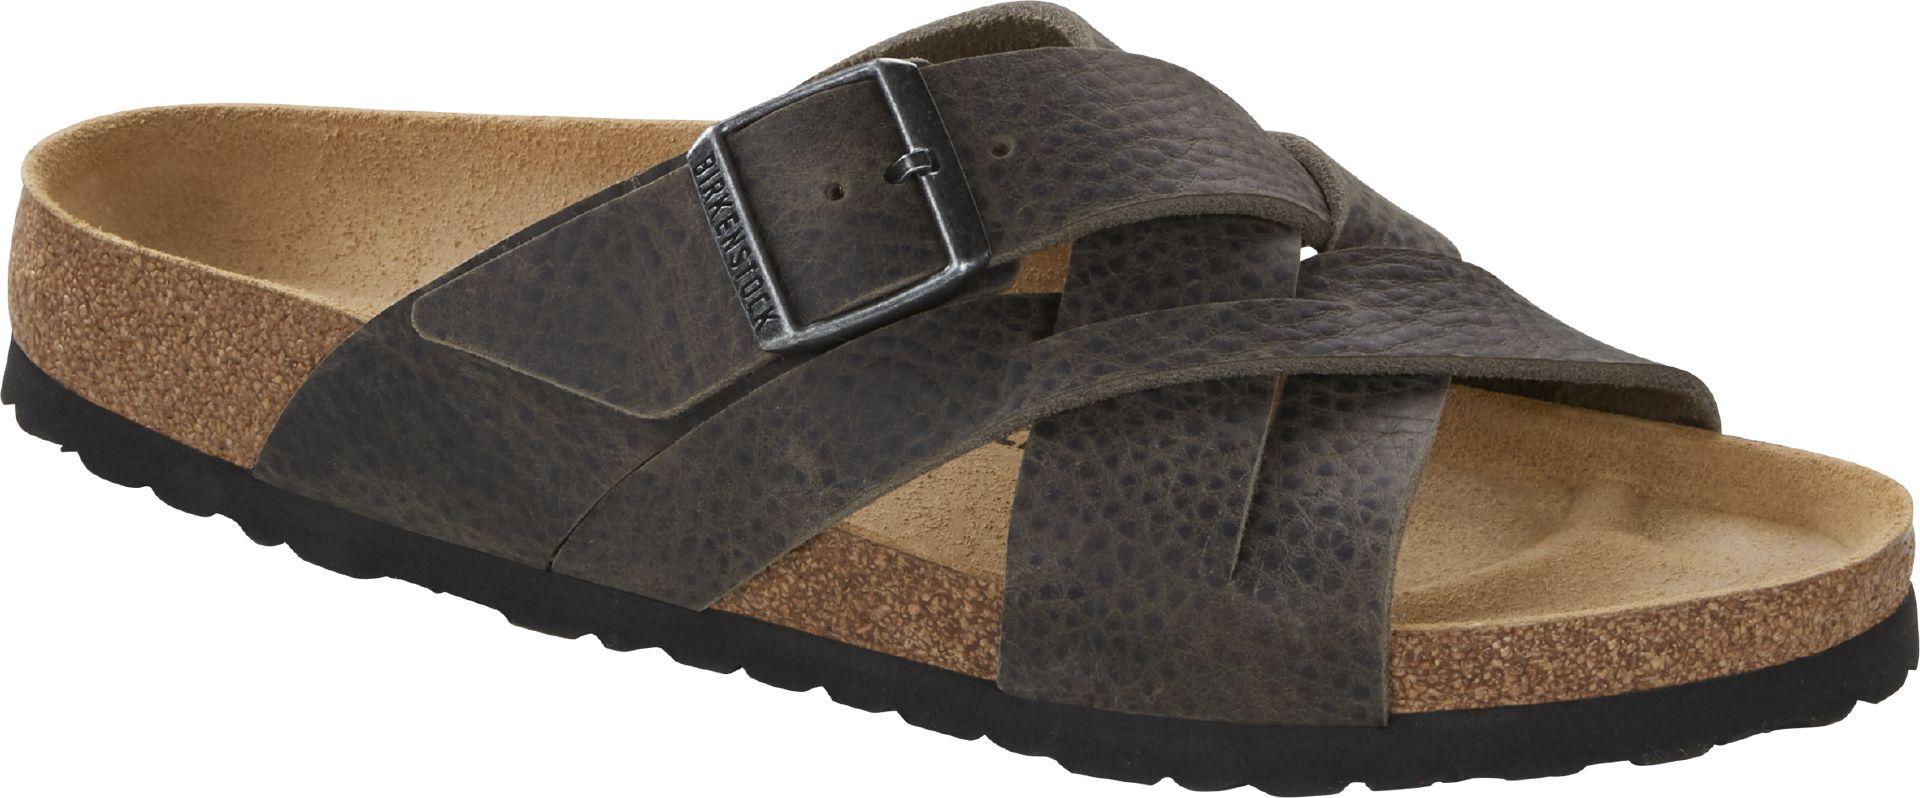 Birkenstock Lugano sandal